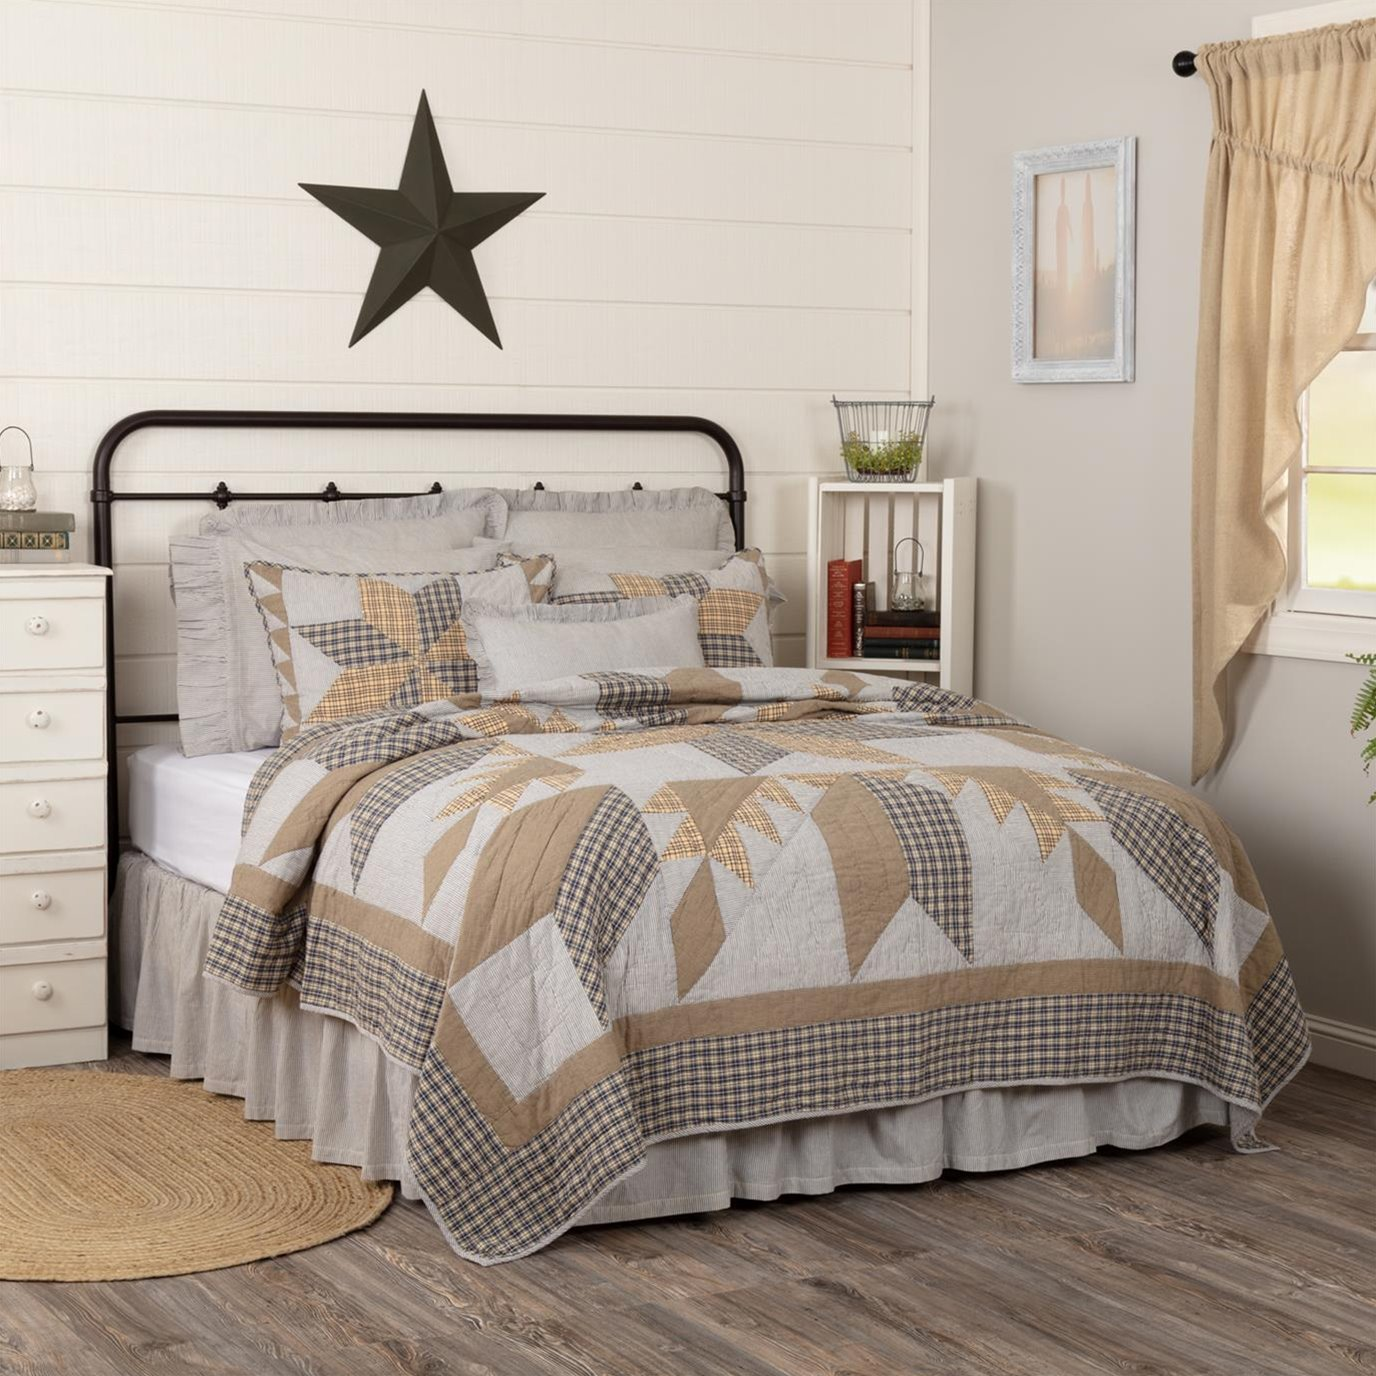 Dakota Star Farmhouse Blue Luxury King Quilt 120Wx105L